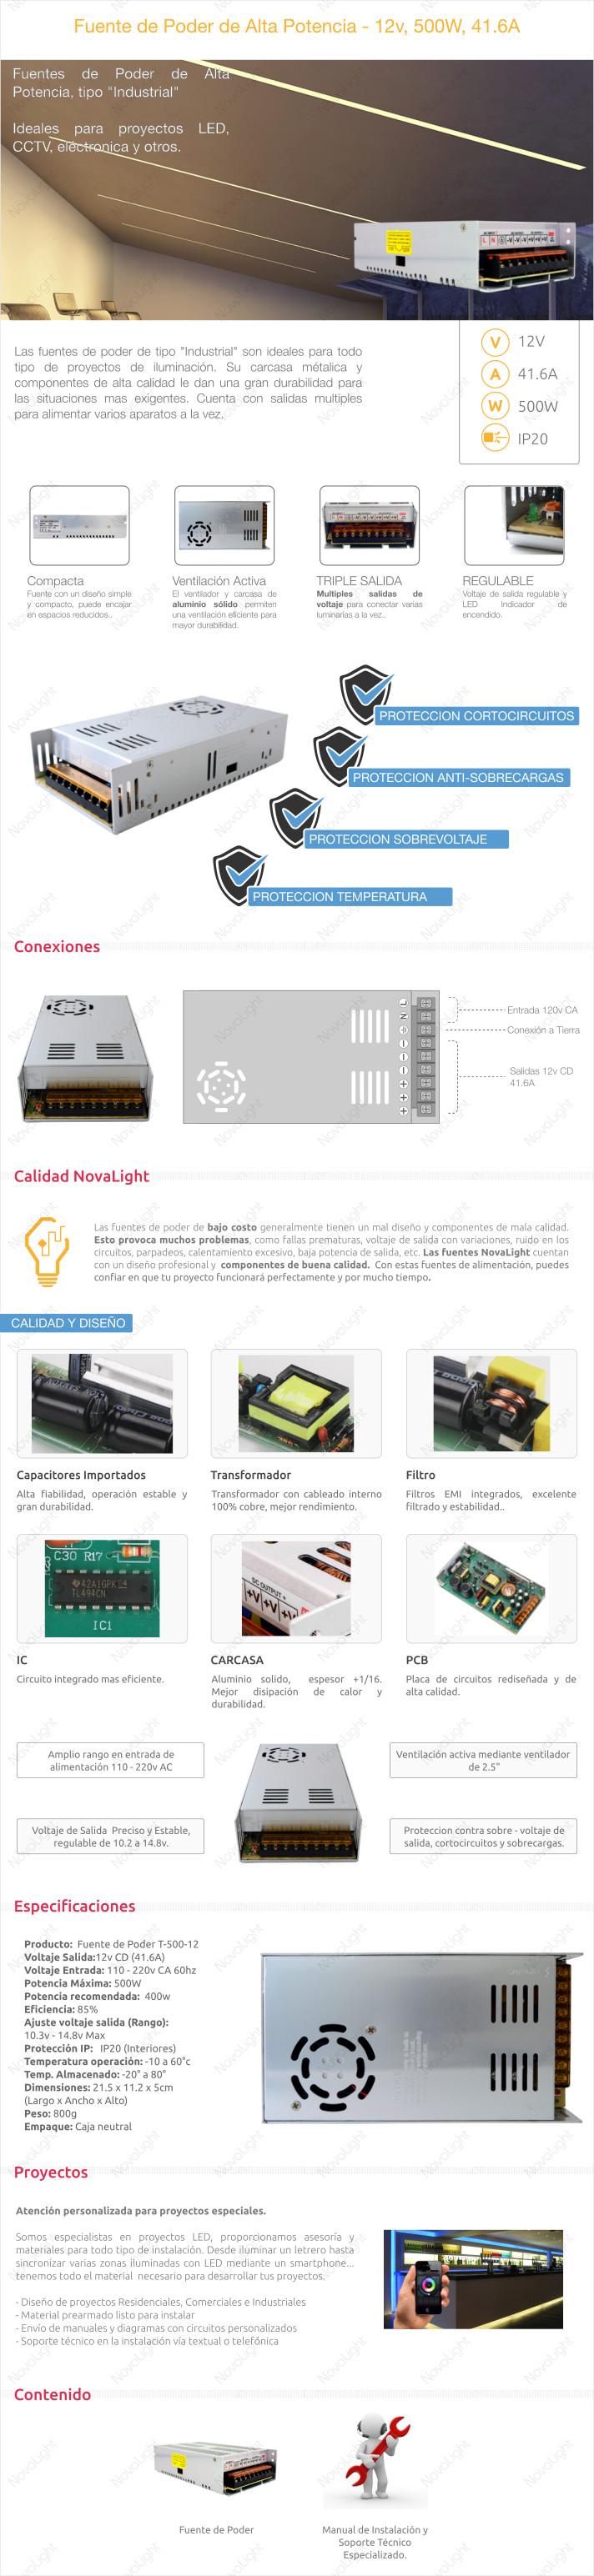 Descripcion de Fuente de Poder 500W, alta potencia para proyectos iluminacion LED